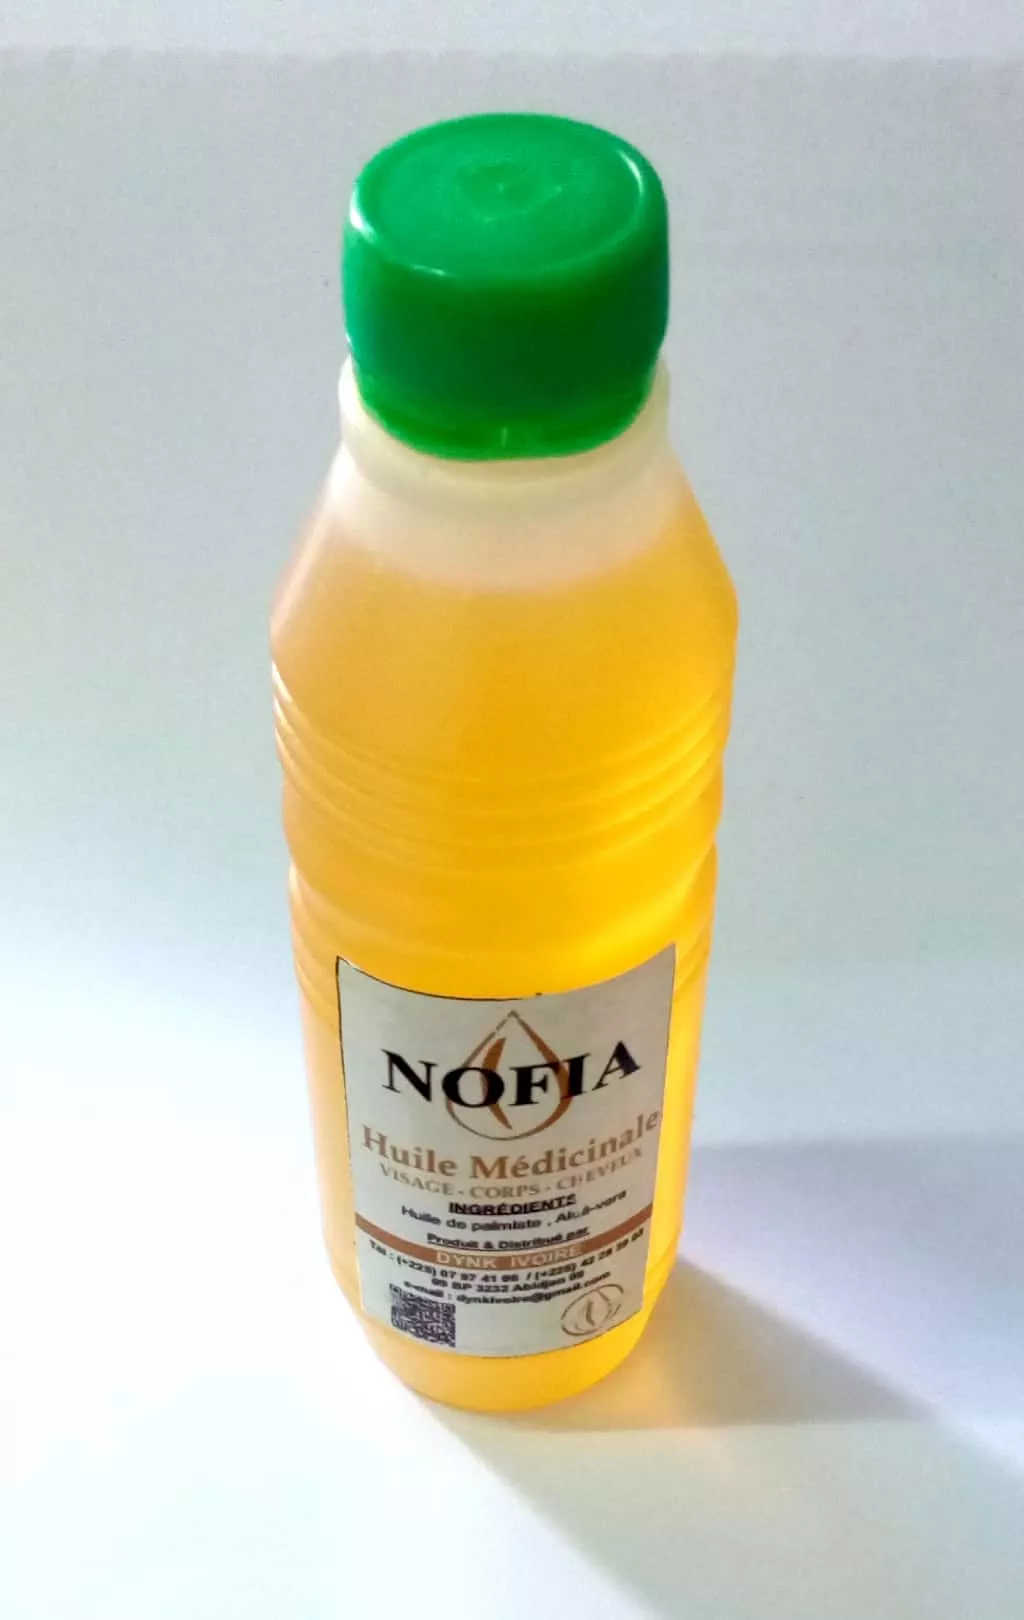 DYNK IVOIRE / NOFIA 250ml  ( 1000FCFA)